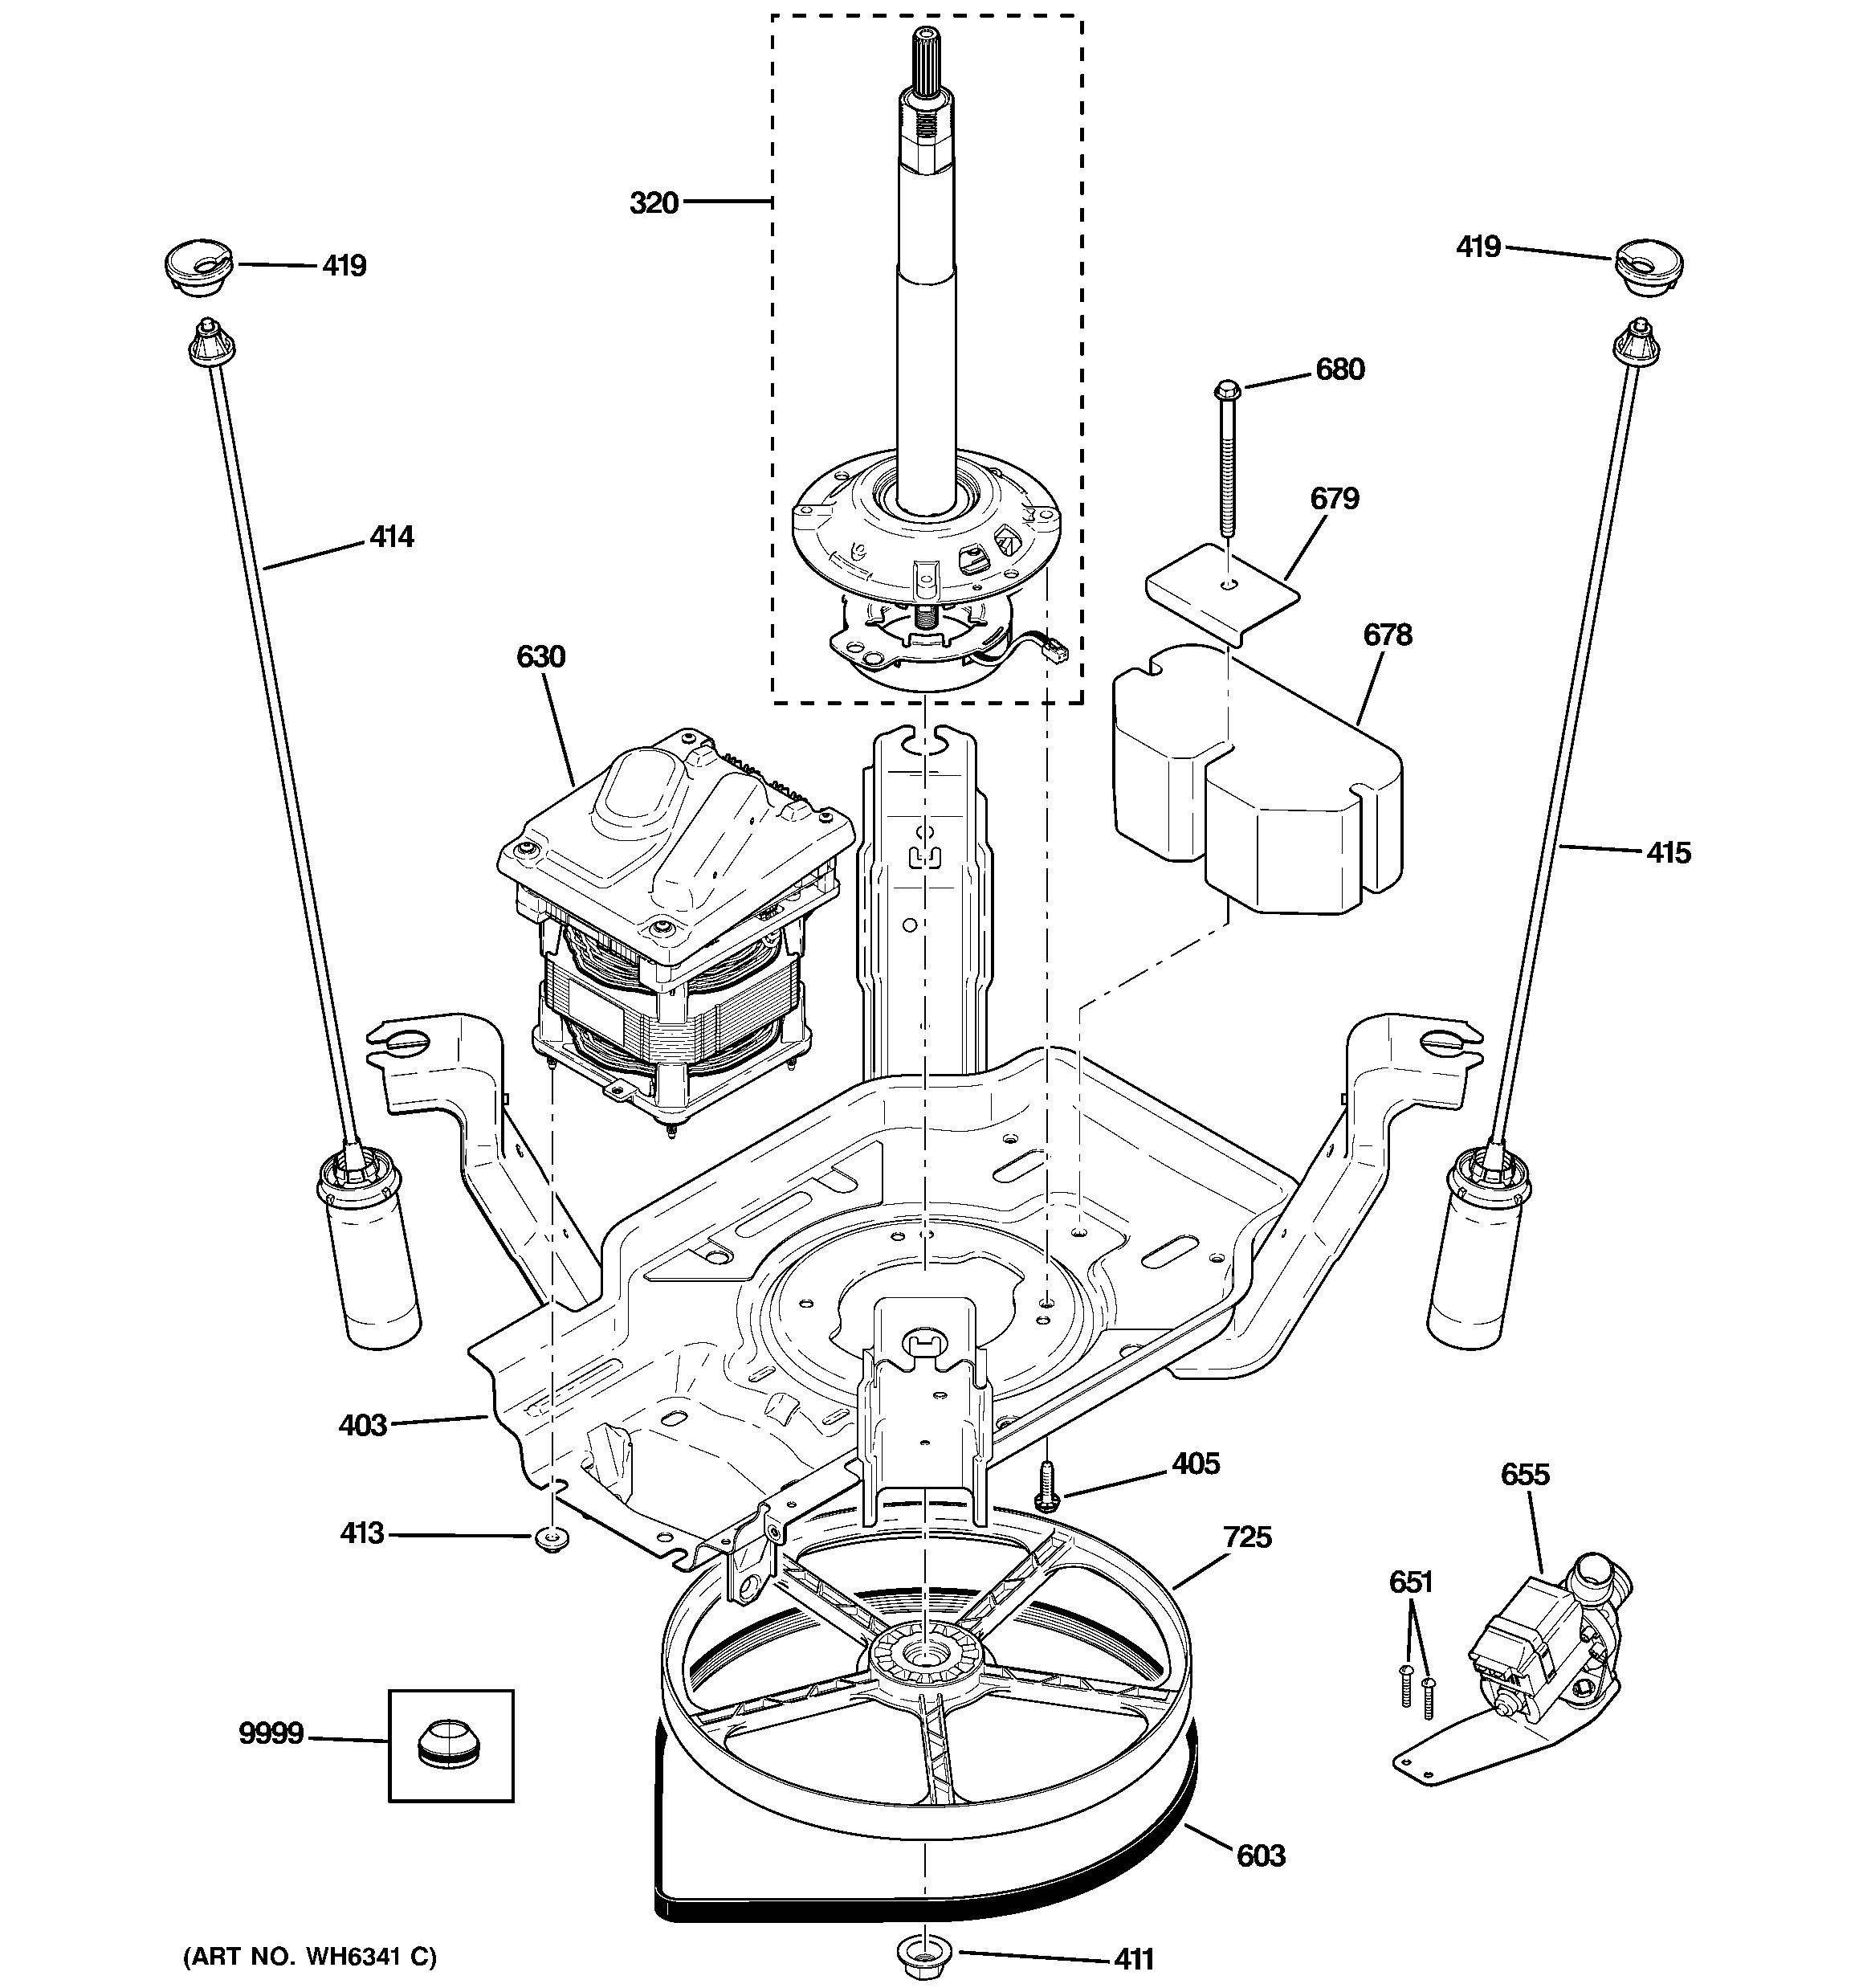 Frigidaire Electric Range Parts Diagram